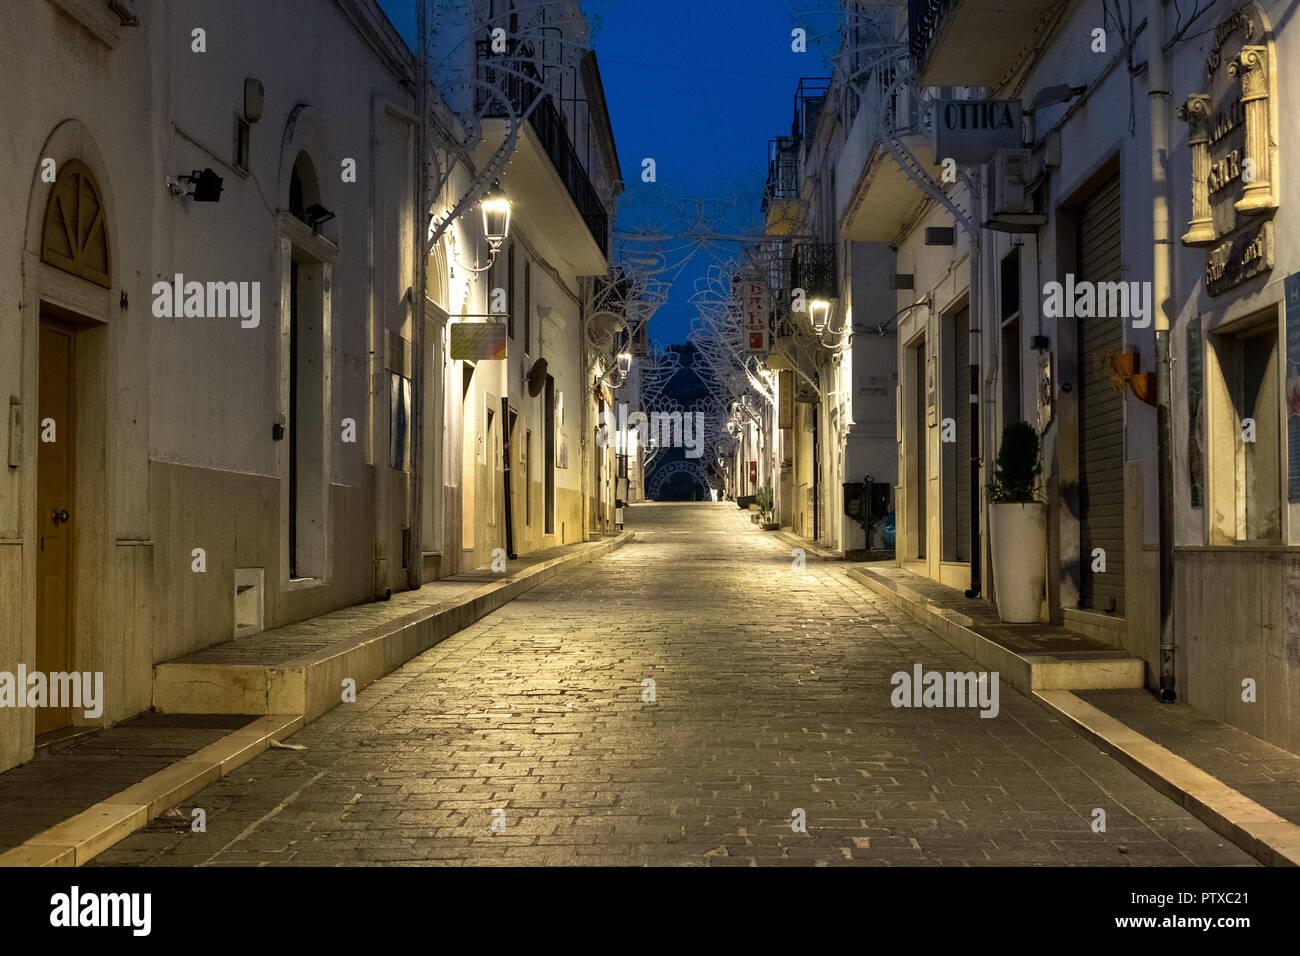 Street scene in Mattinata, on the Adriatic coast in the Gargano Peninsula, Puglia, Italy. Photographed at night in late summer. - Stock Image